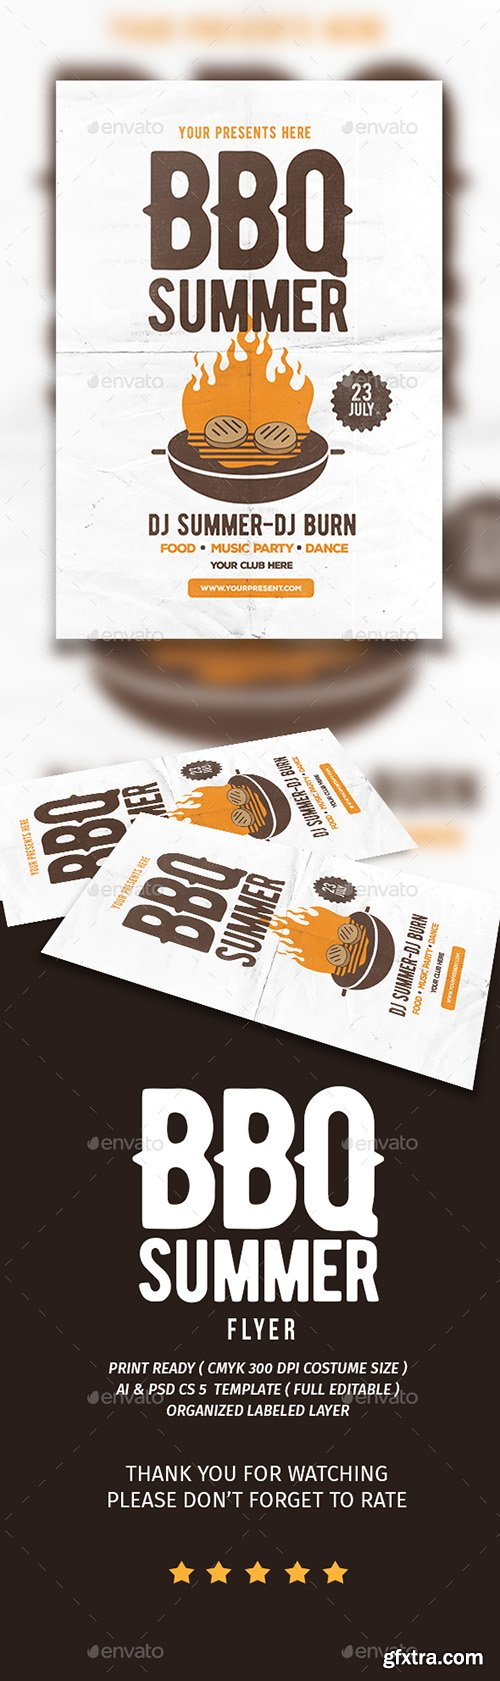 BBQ Summer Flyer 16812206